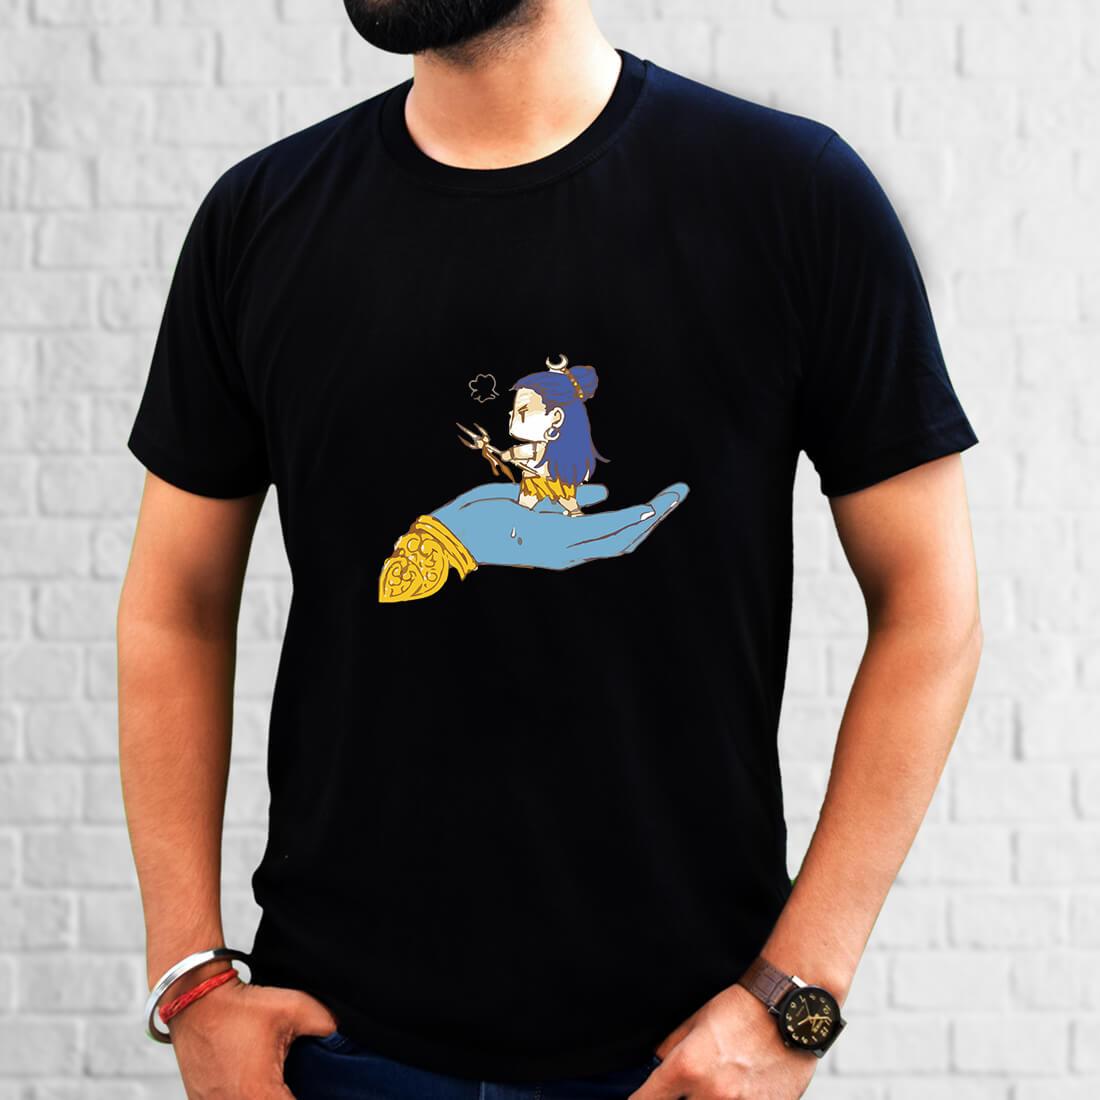 Shiva Painting Printed Plain Black T Shirt Online